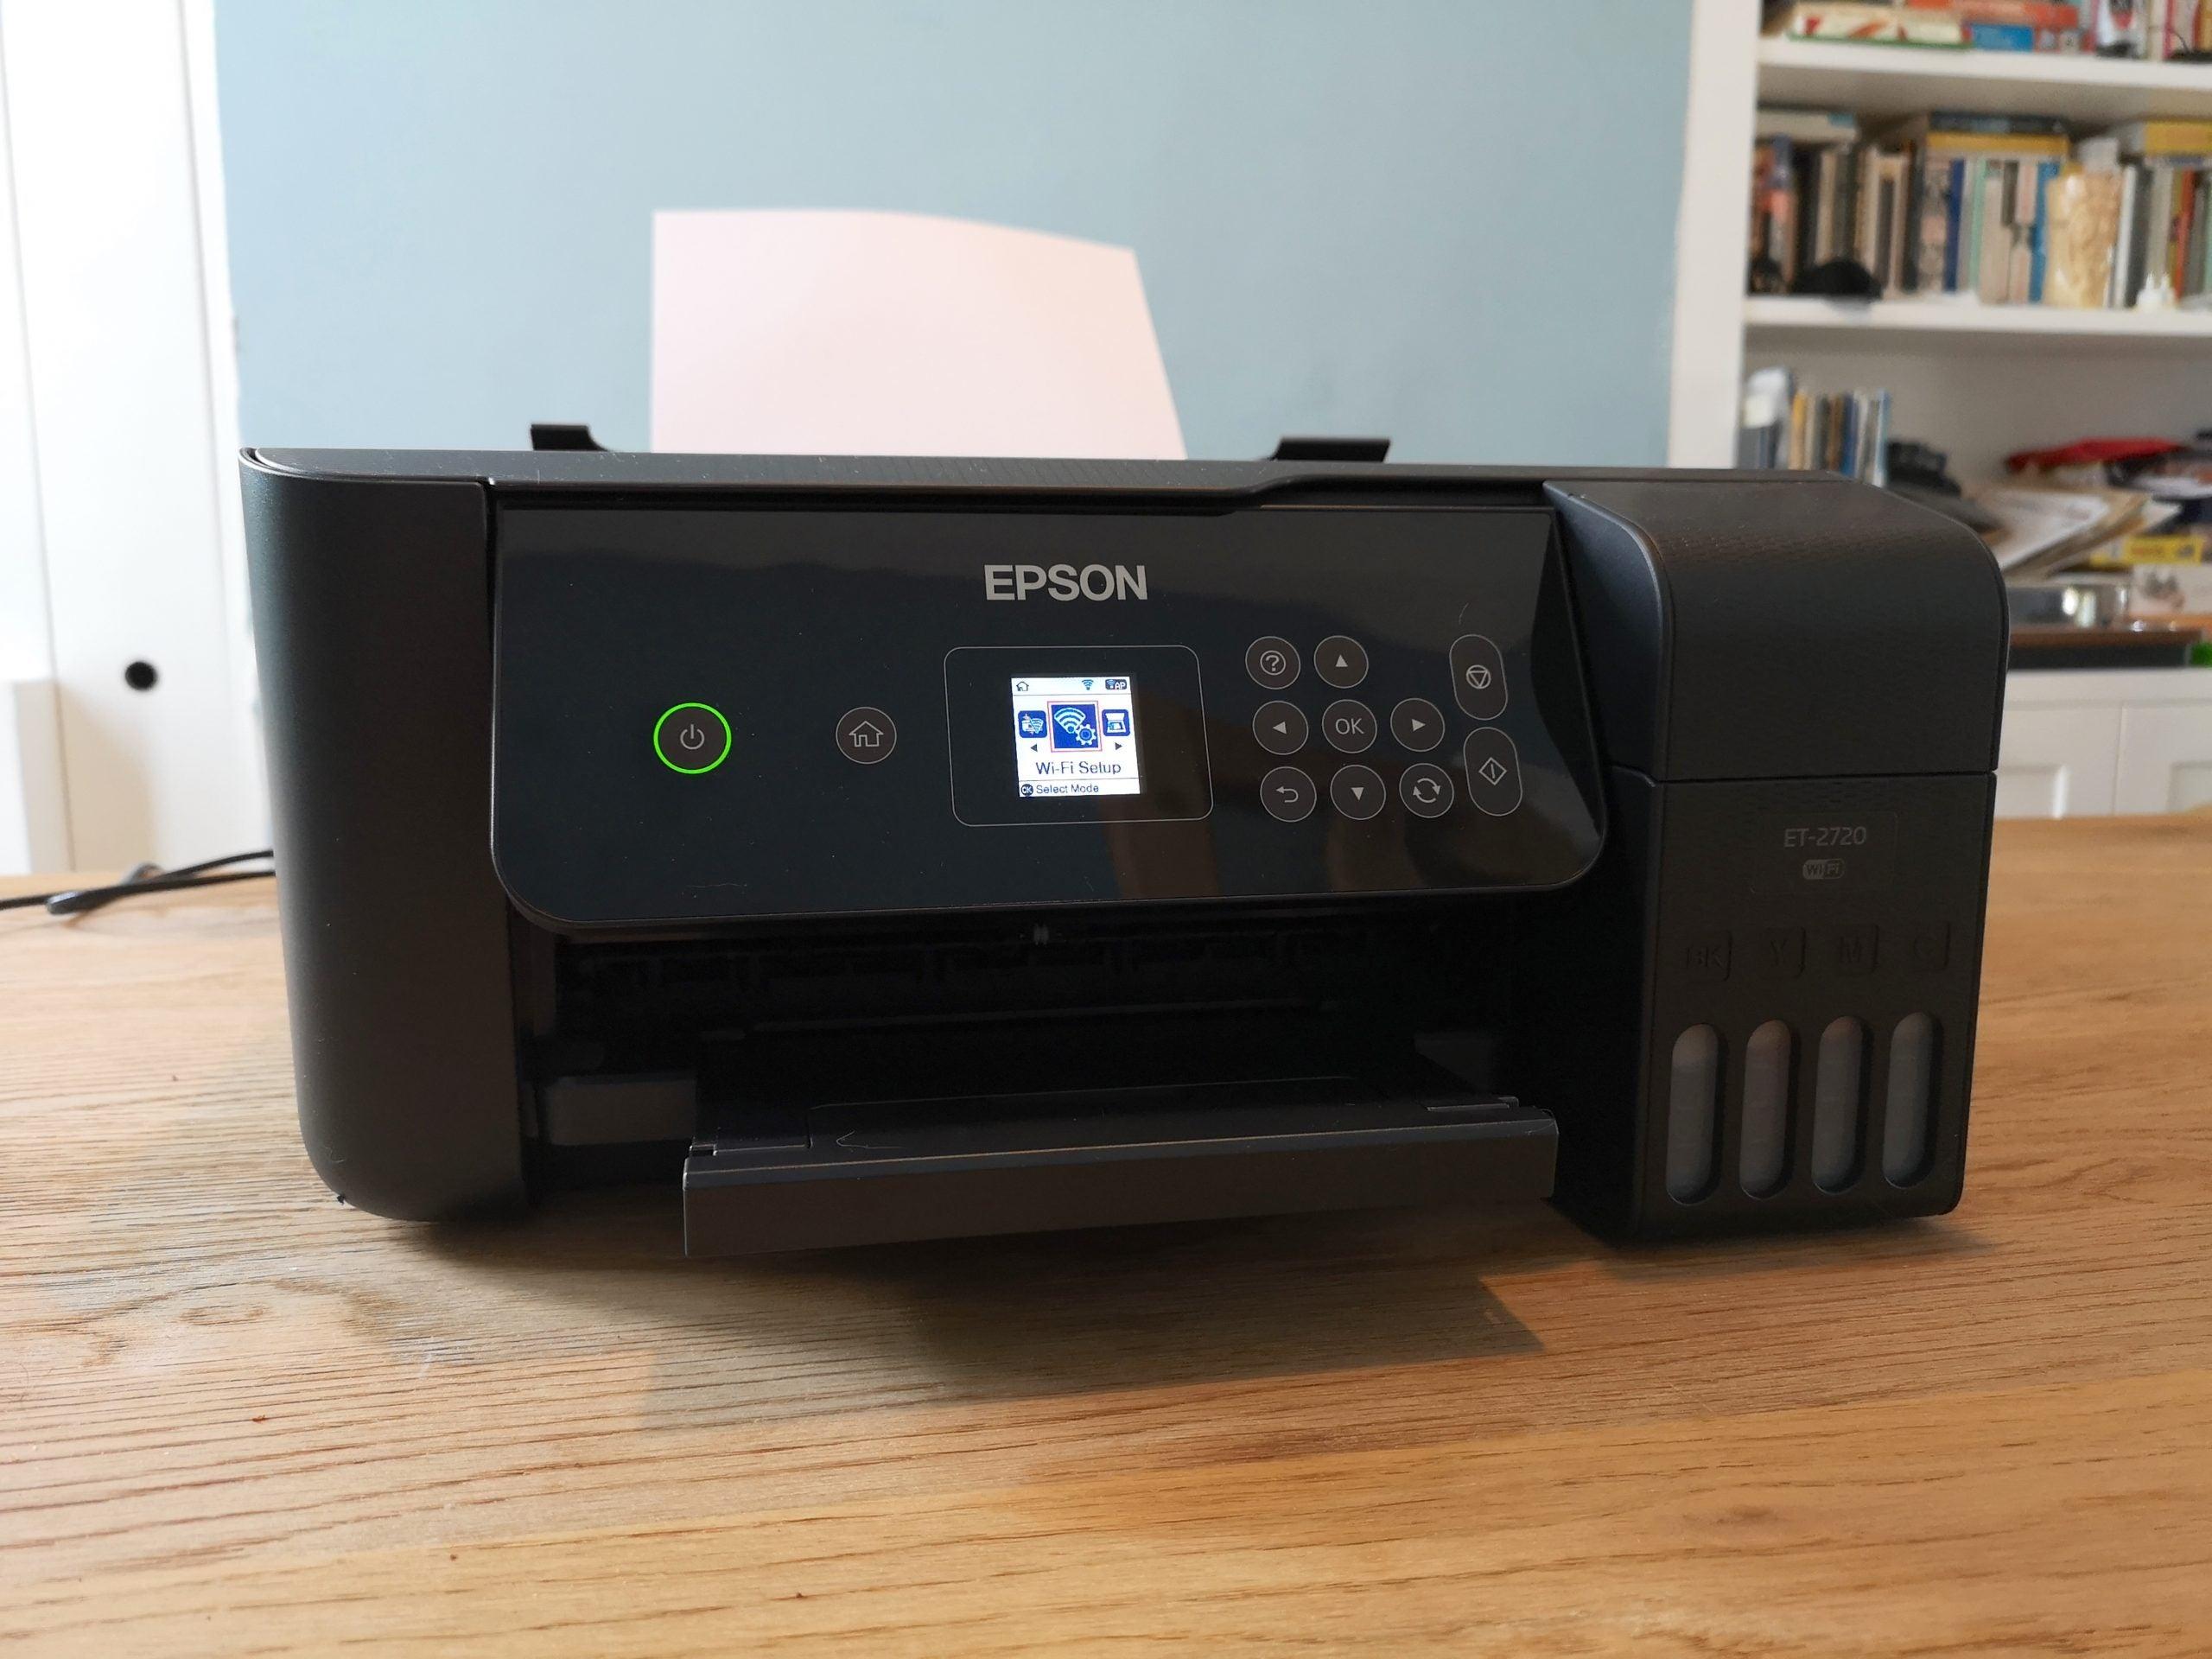 Epson Ecotank Et 2720 Review Trusted Reviews